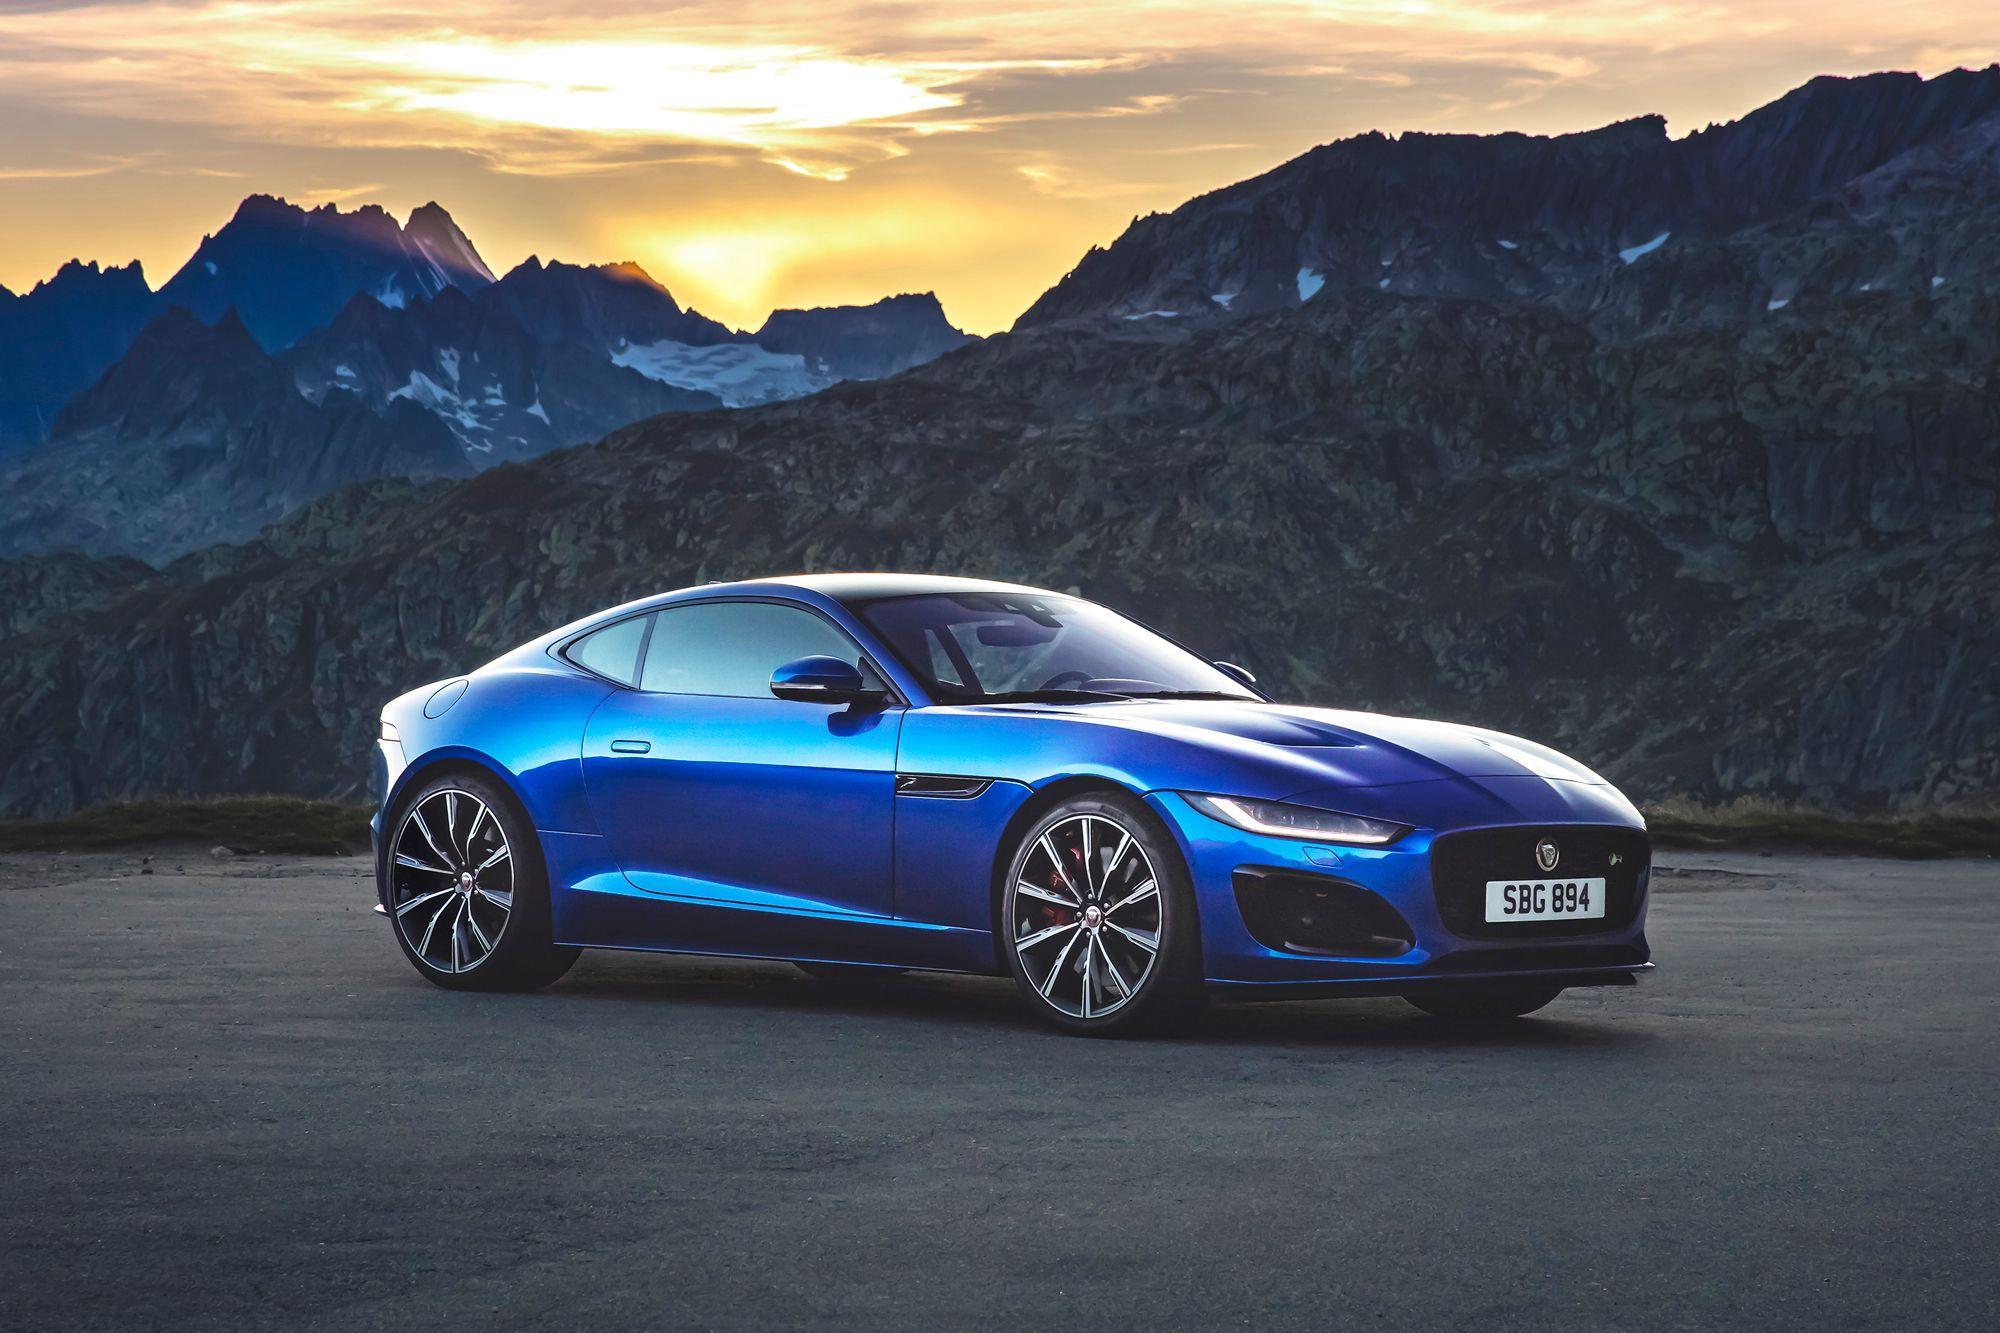 2019 Jaguar F Type Rumors Release Date Redesign >> 2021 Jaguar F Type Looks Angrier Than Before